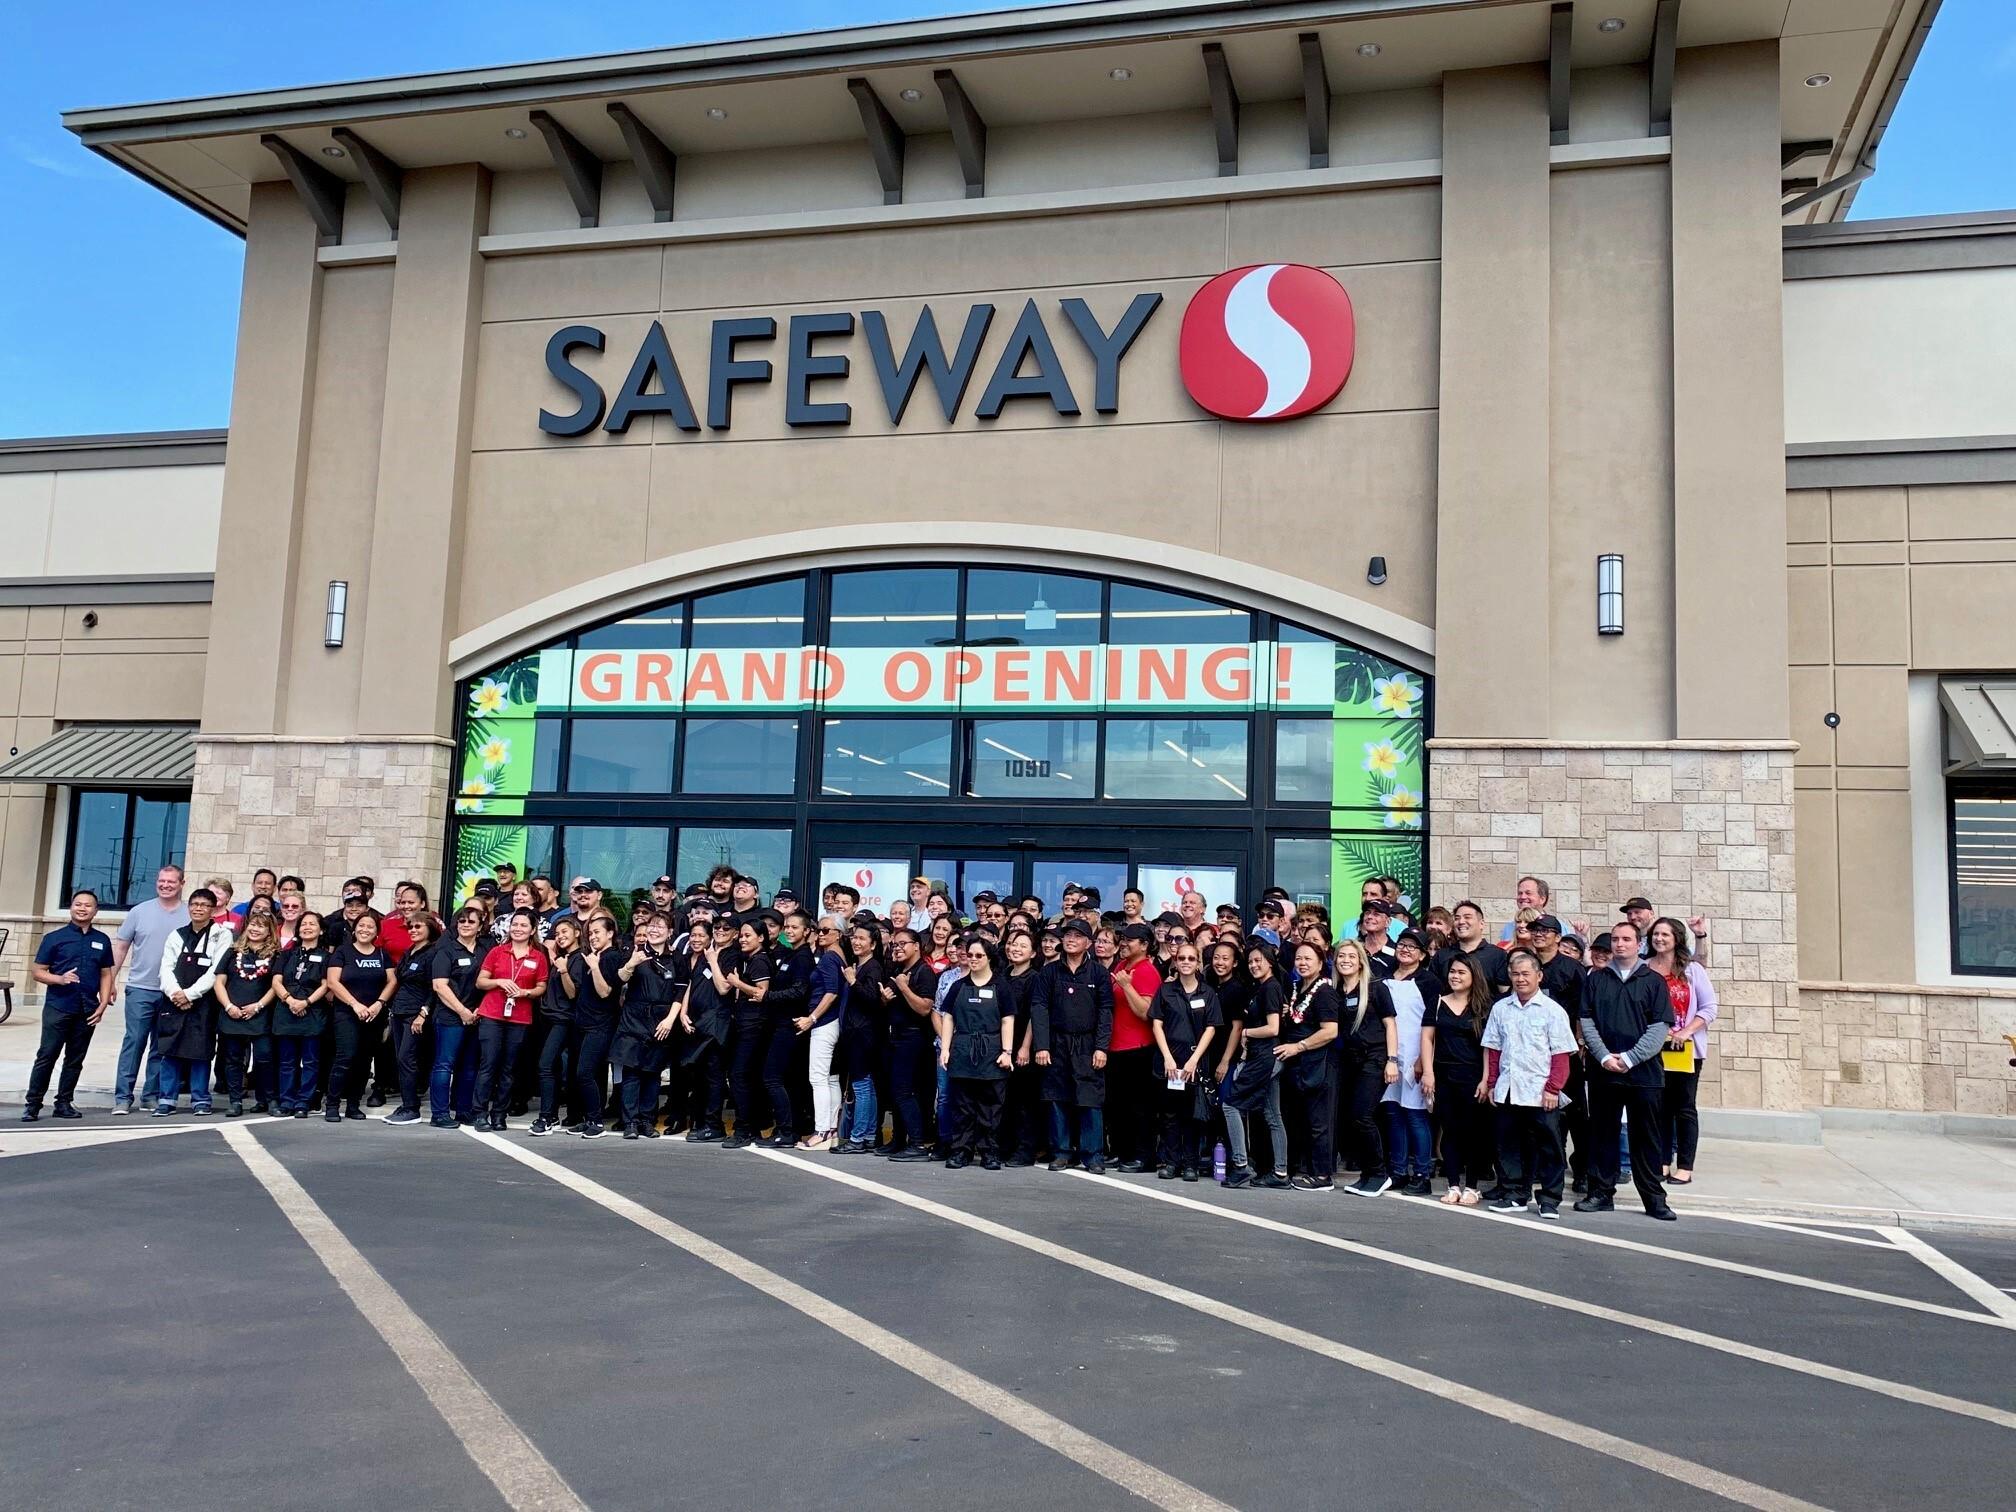 Hoʻokele Safeway Grand Opening